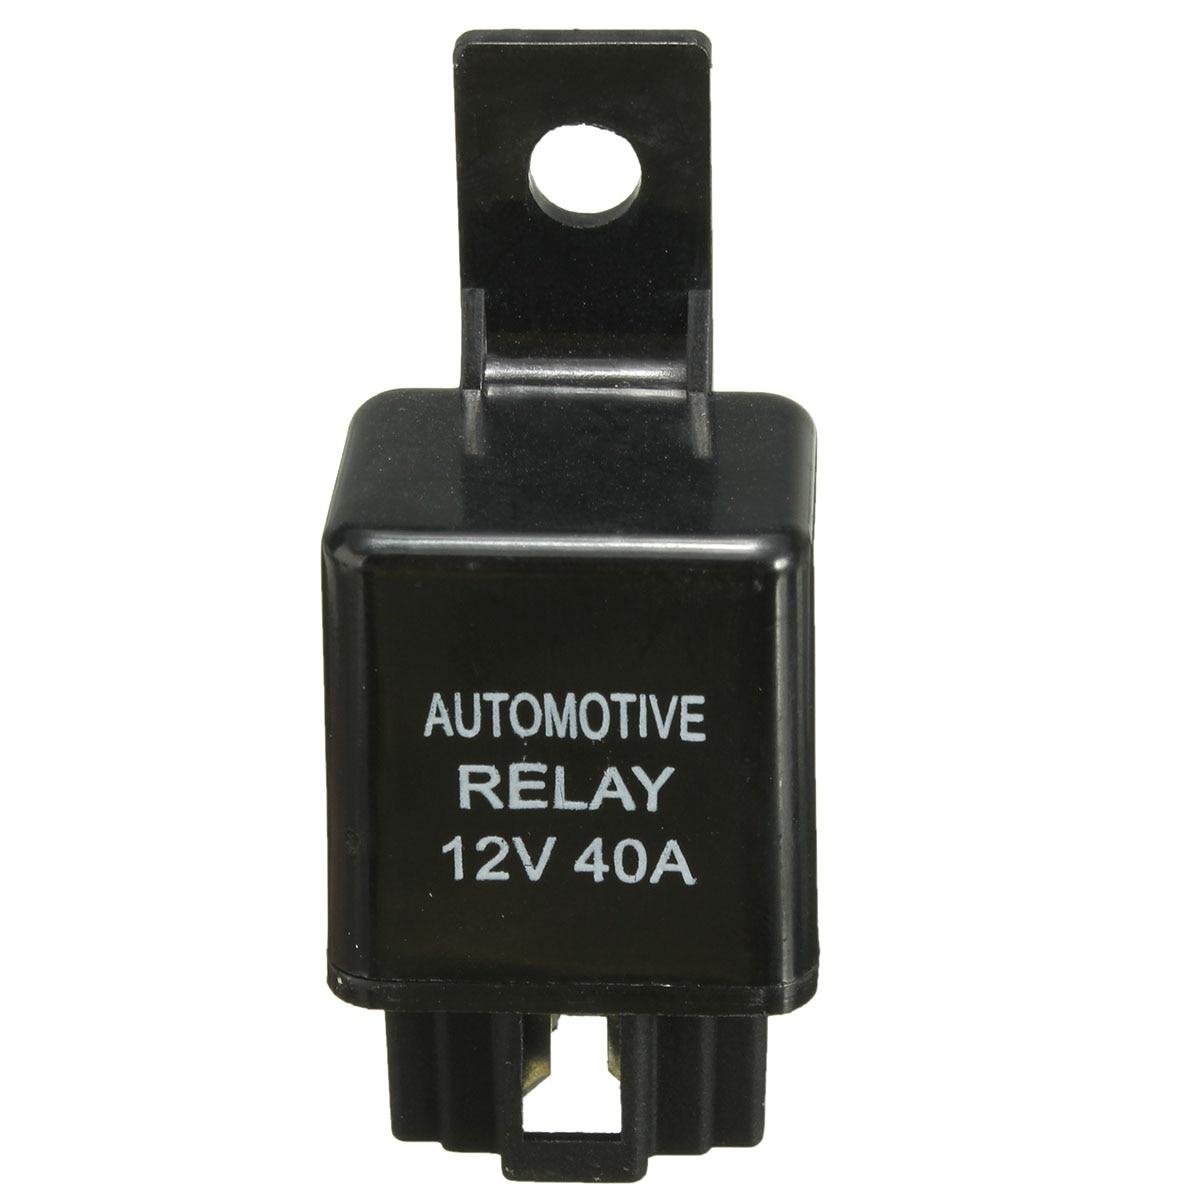 12V 40A 40 AMP Auto Auto Automotive Van Boat Bike 4 Pin SPST Alarm Relais